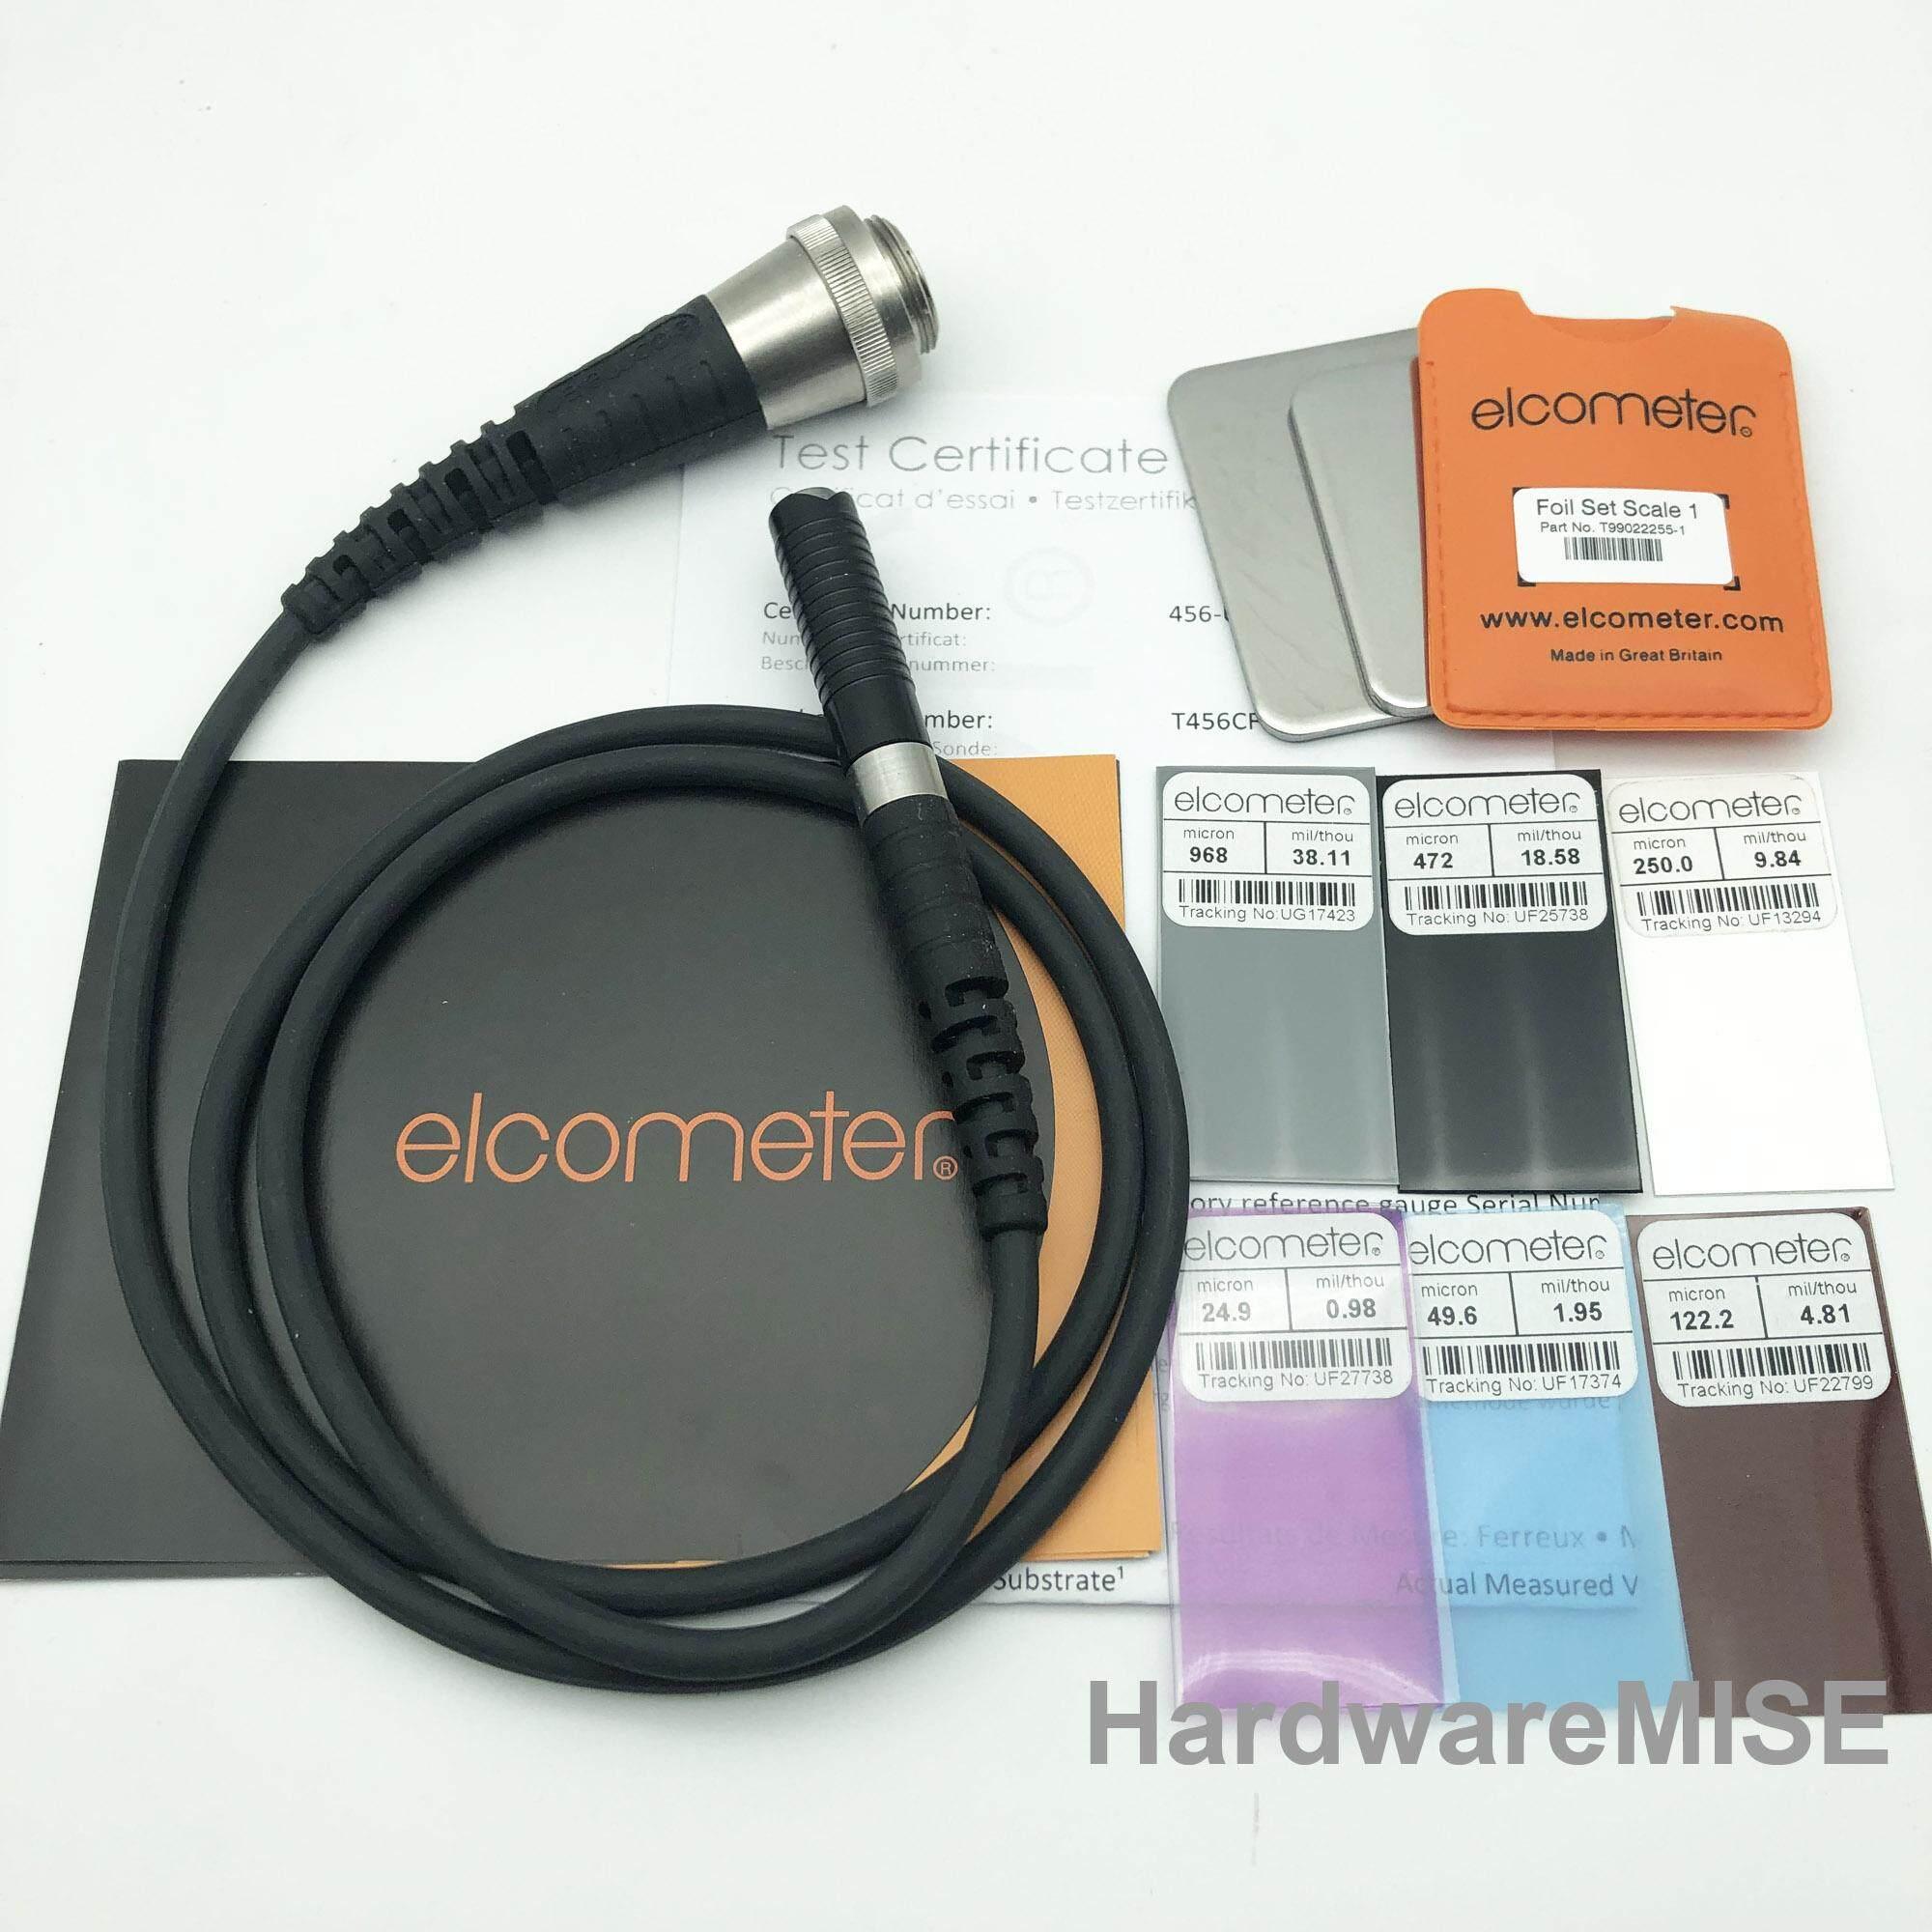 Elcometer 456 T456CF1S T456CFNF1S F1 Standard Probe 0-1500um/0-60mils